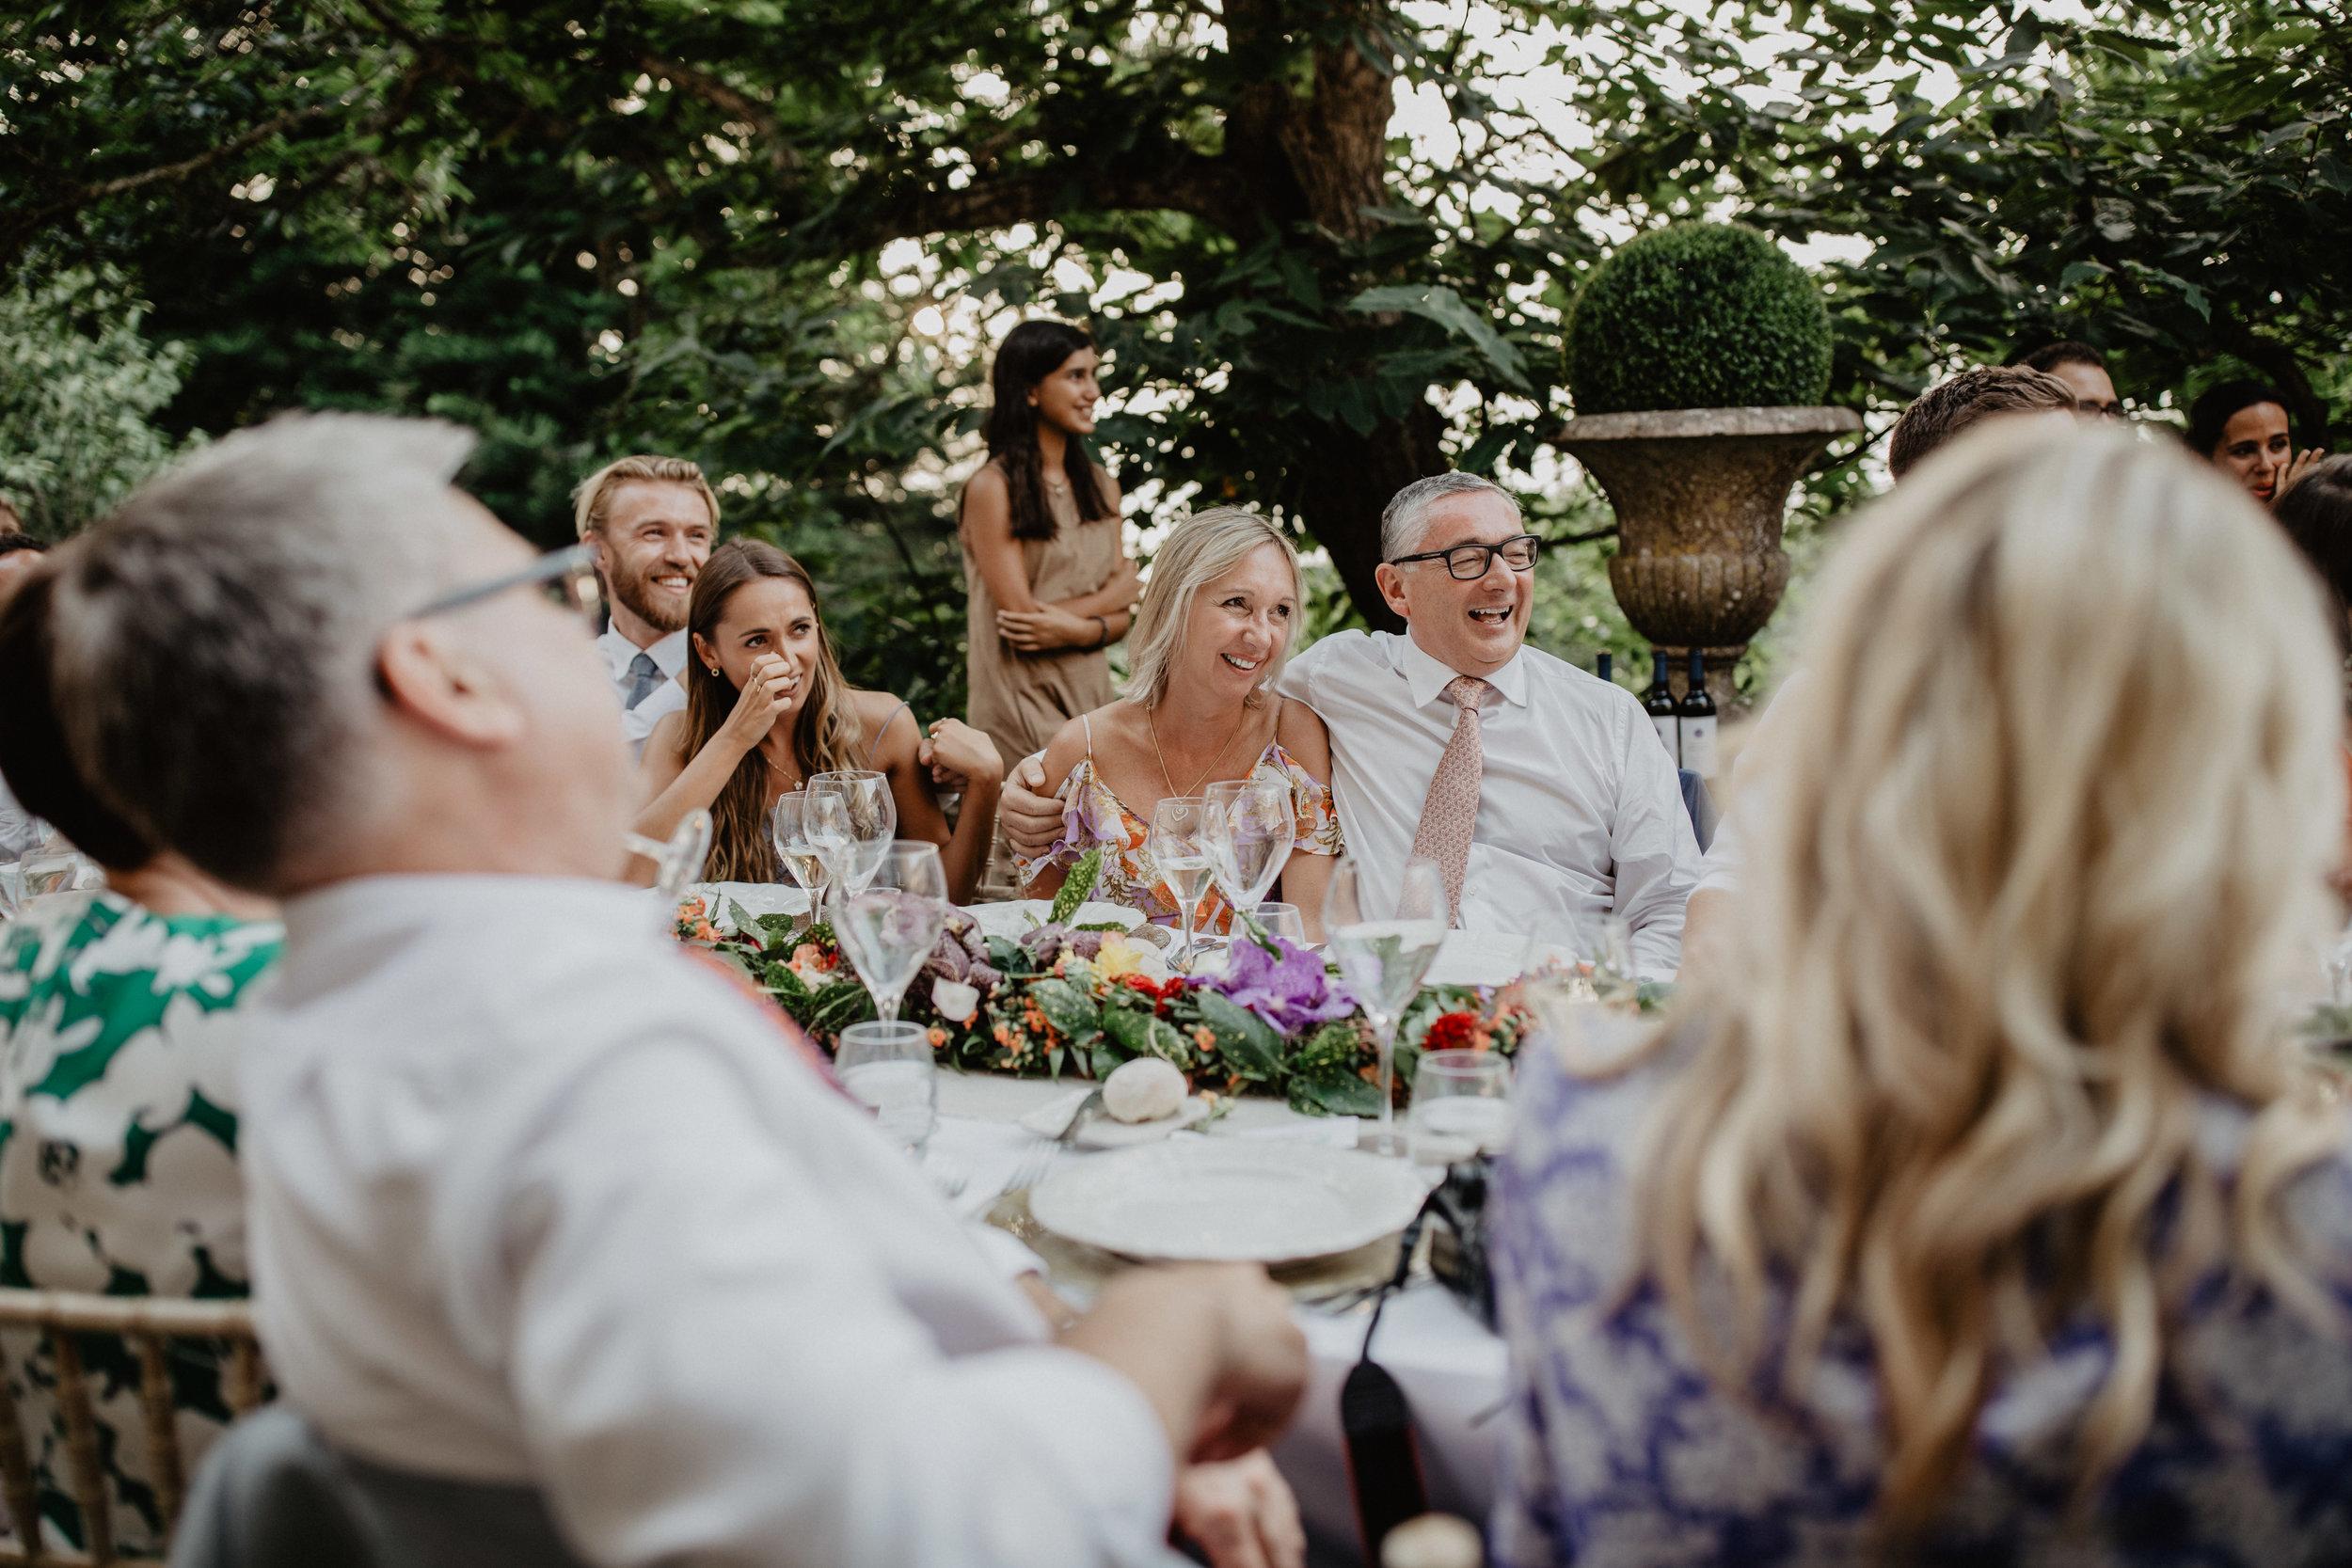 Lapela-photography-wedding-sintra-portugal-112.jpg